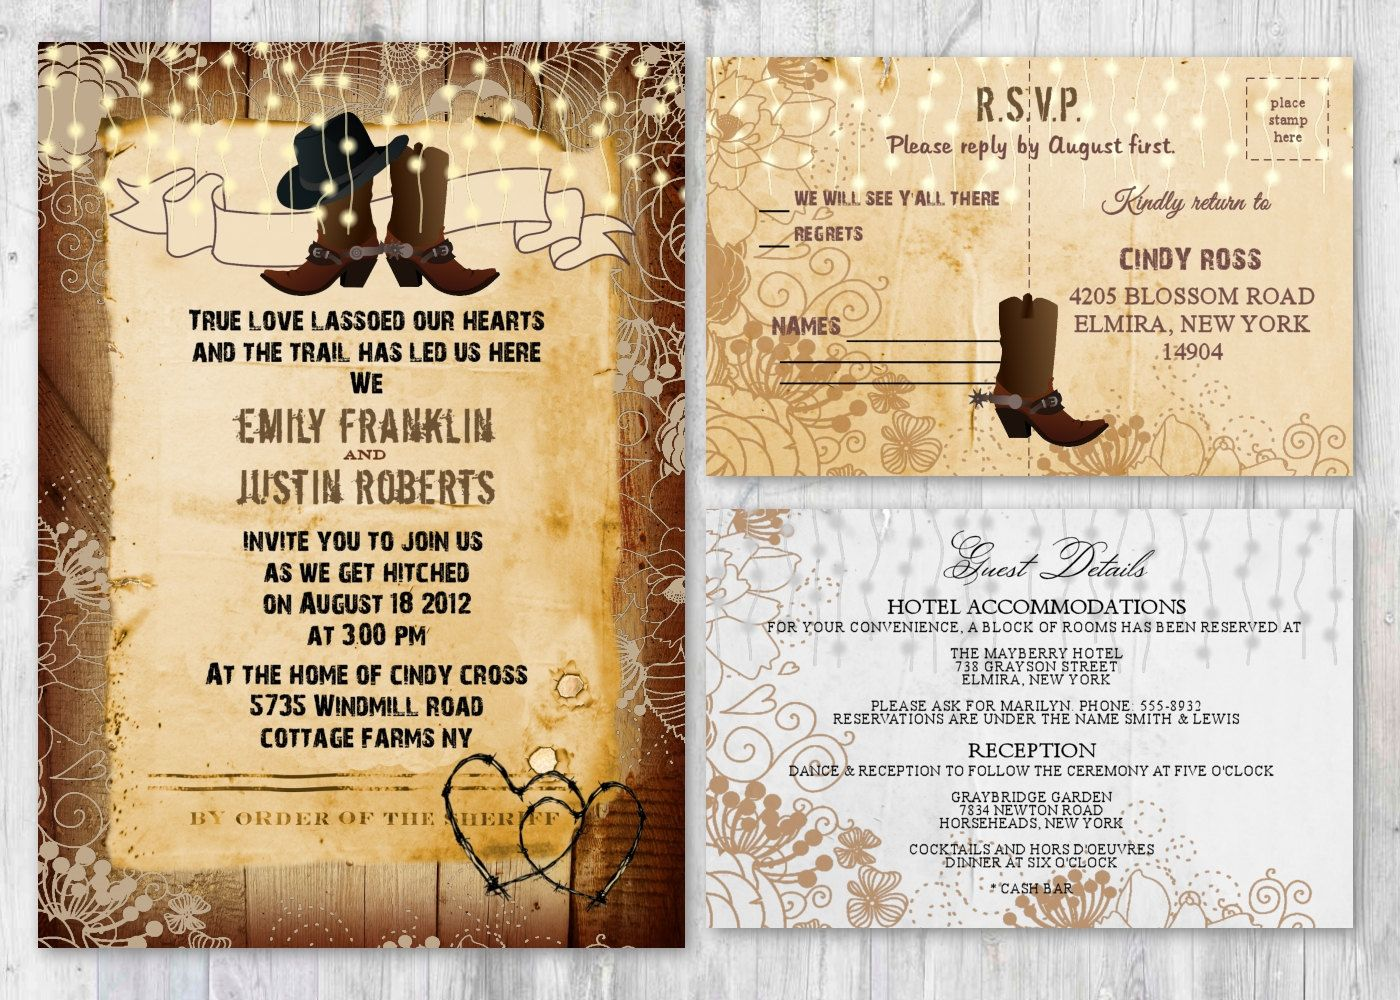 Cowboy Boot Wedding Invitations: Western, Rustic Wedding Invitations, Cowboy Boot Boots